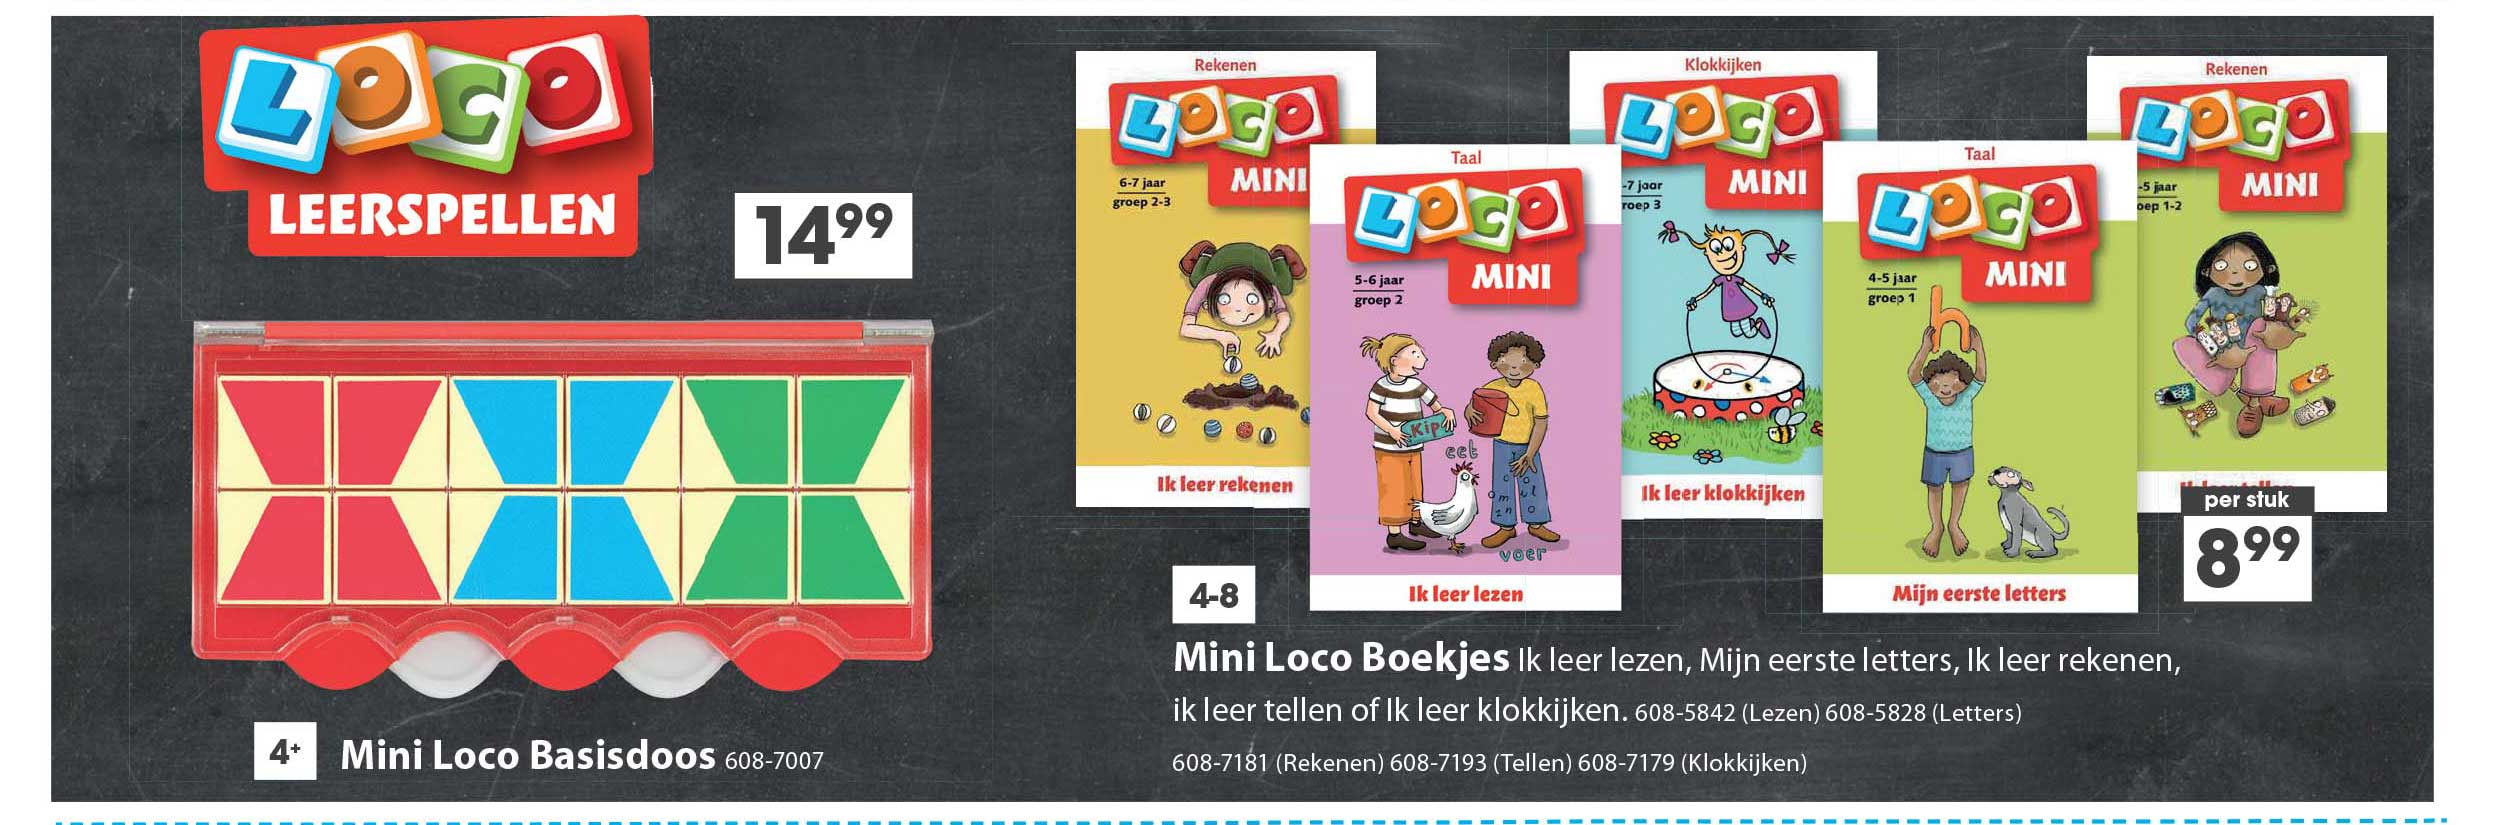 Top 1 Toys Mini Loco Boekjes